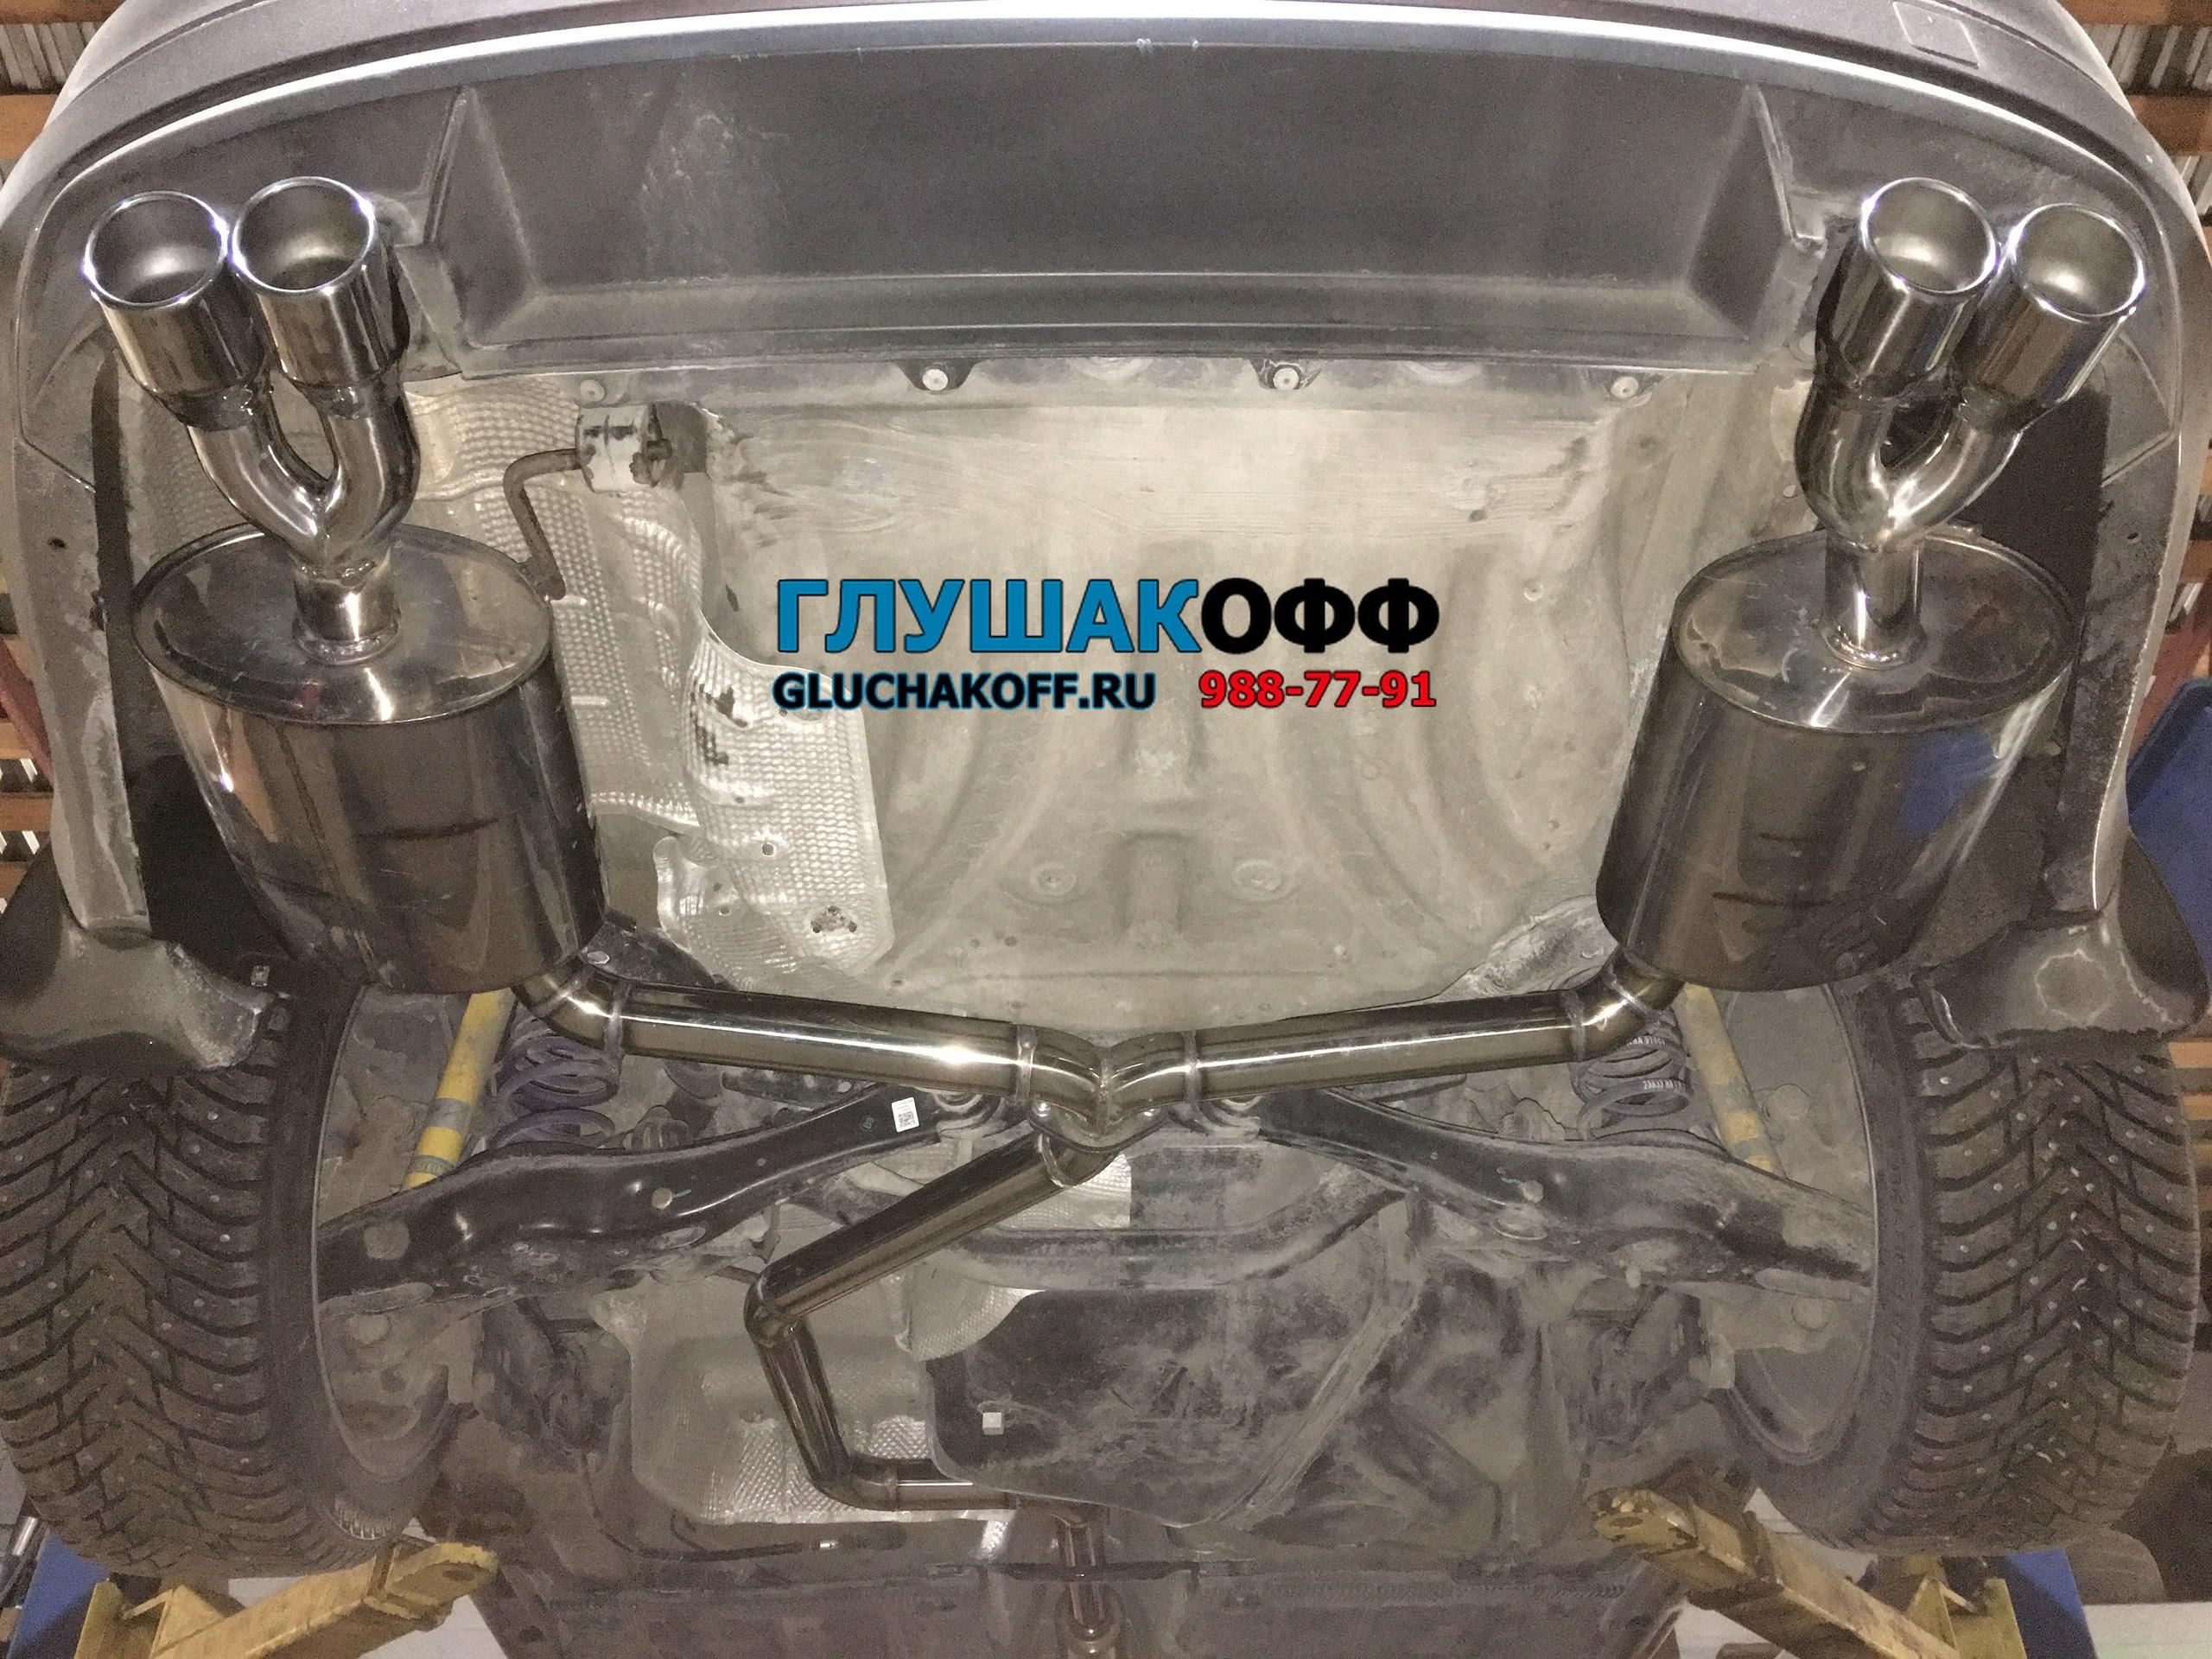 Skoda Octavia A7 - Custom-тюнинг выхлопной системы by GluchakoFF